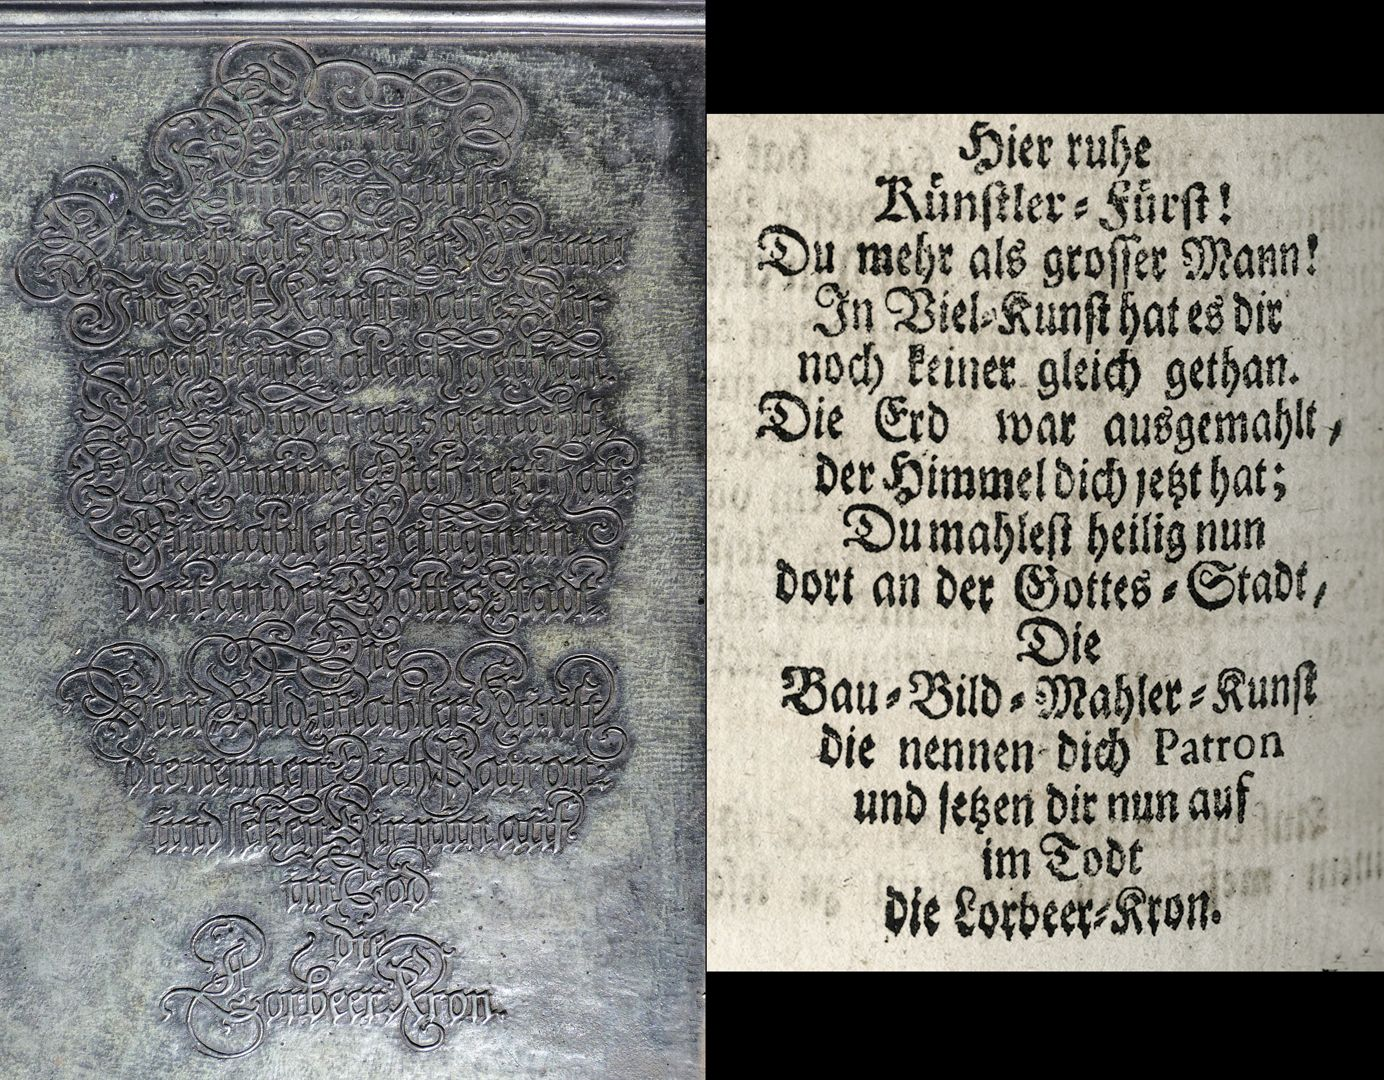 "Albrecht Dürer Grabstätte Deutsche Inschrift und Auszug aus Joh. Martin Trechsels, Großkopf genannt: ""Verneuertes Gedächtnis des nürnbergischen Johannis Kirch Hof ..."" , Franckf. & Leipzig 1735"